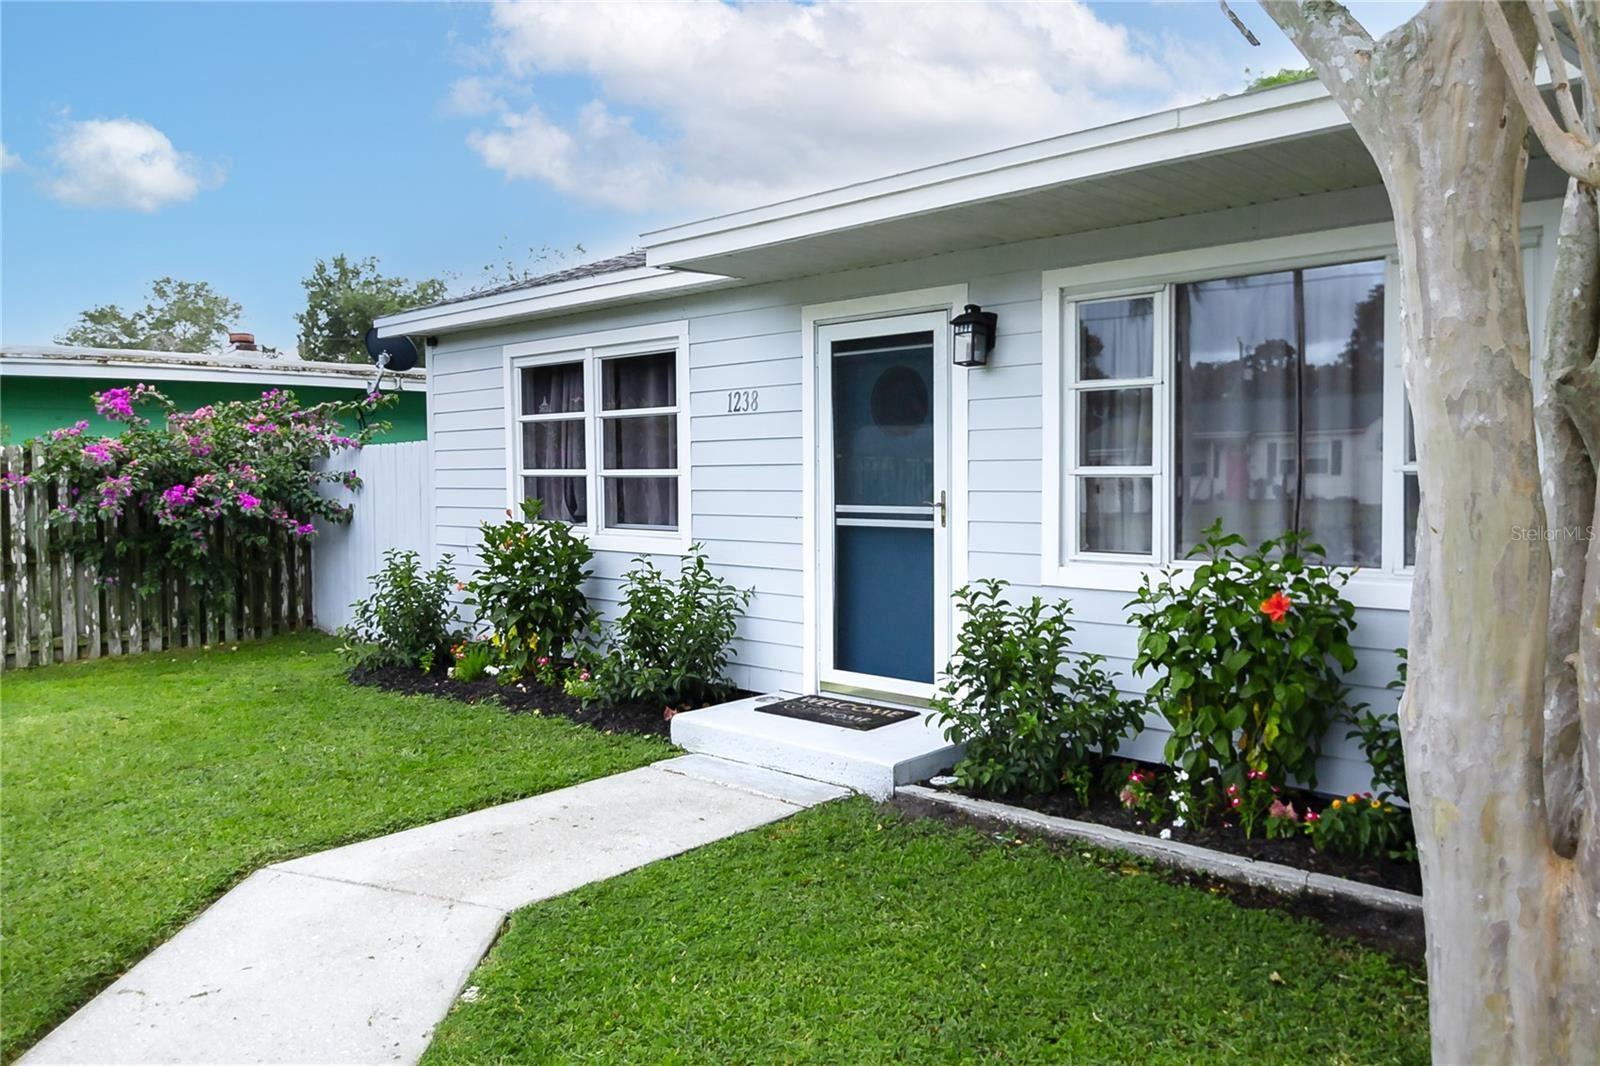 Photo of 1238 RHODES AVENUE, SARASOTA, FL 34239 (MLS # A4512671)